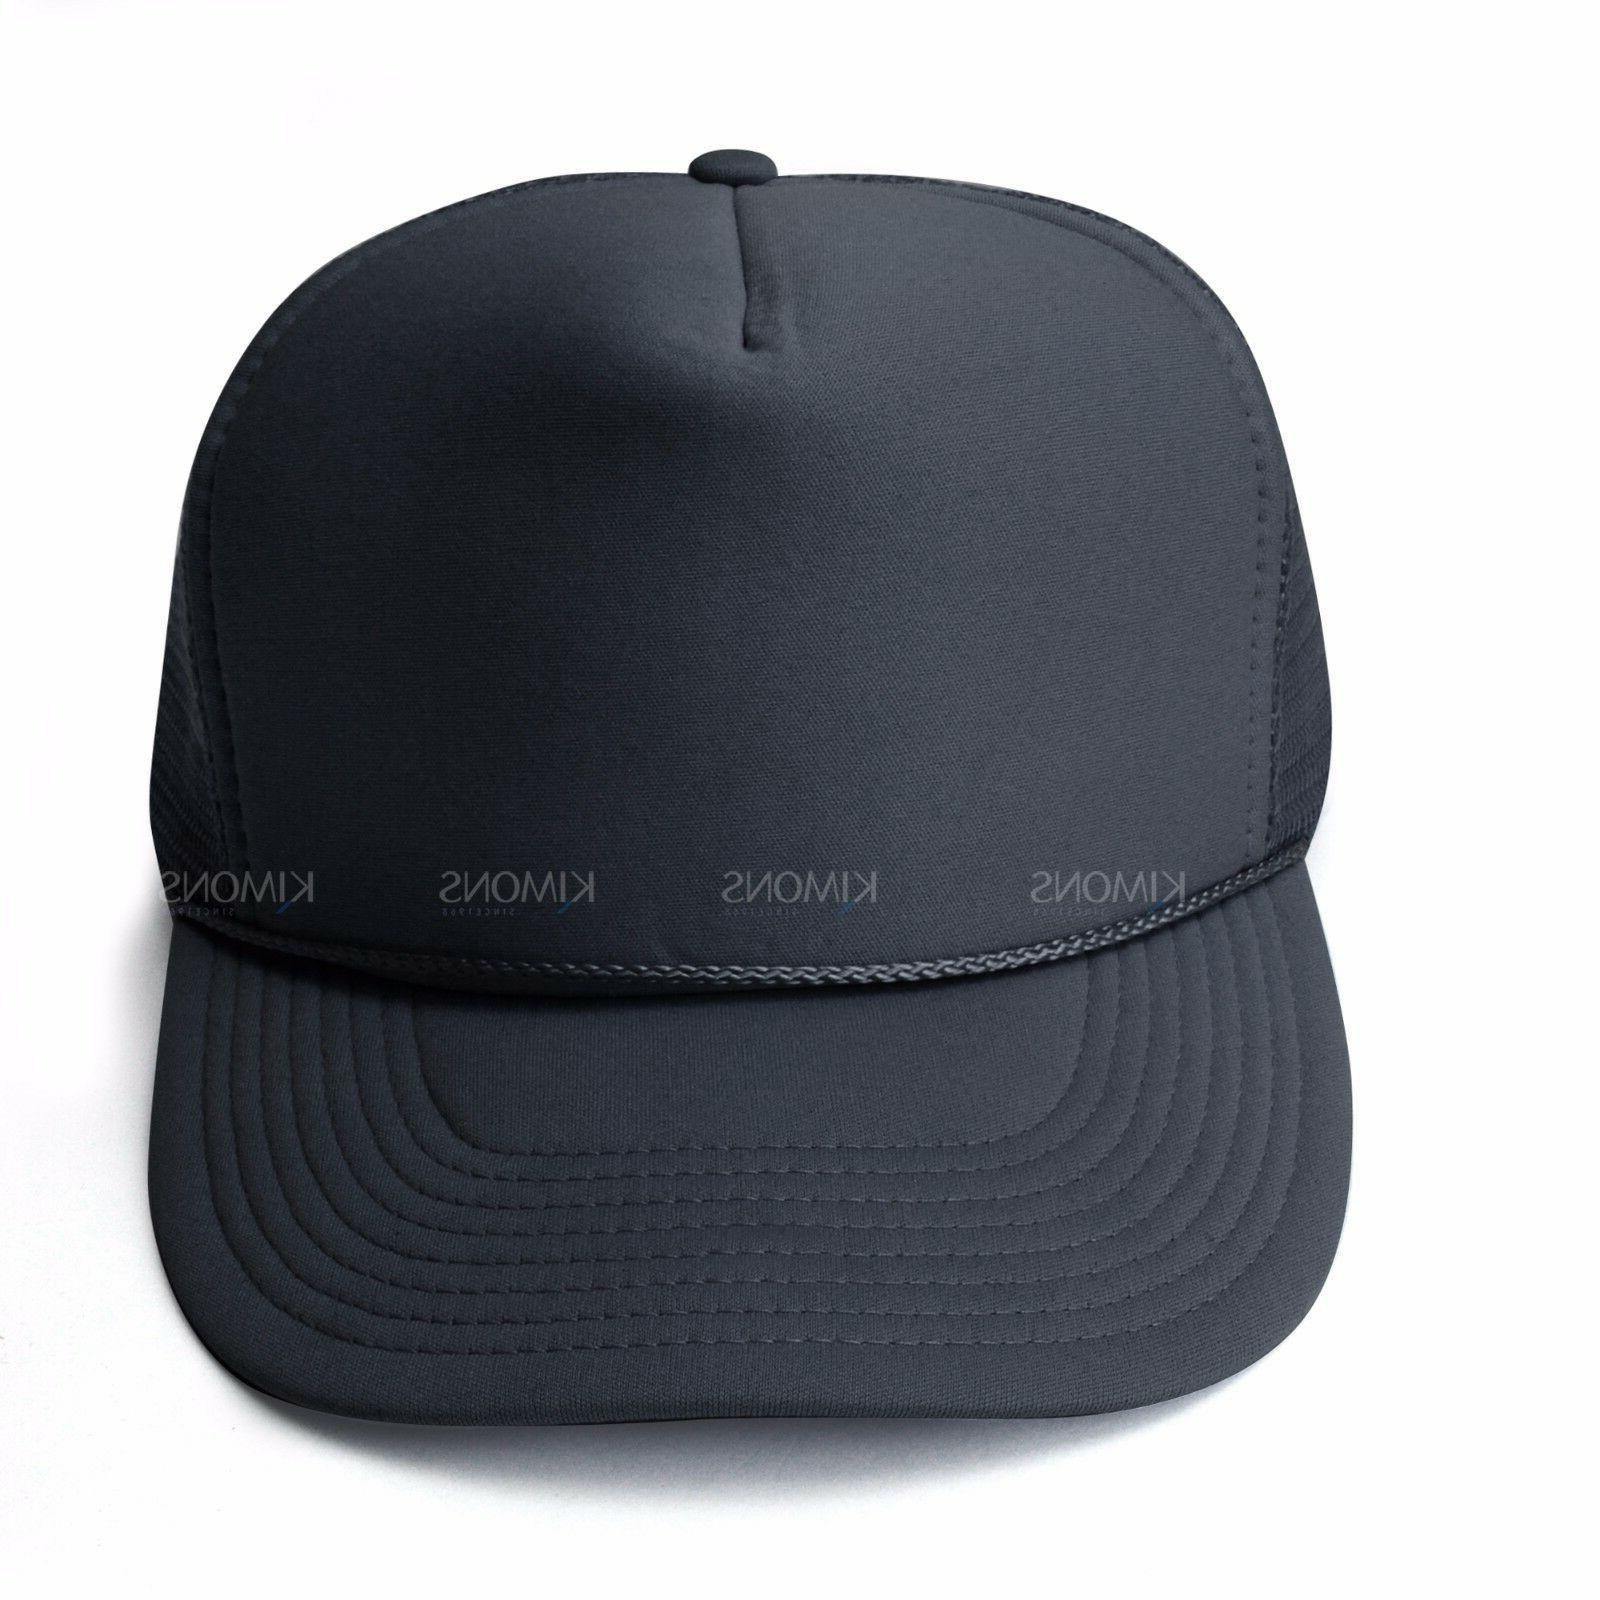 Trucker Hat Baseball Cap Adjustable Solid Dad